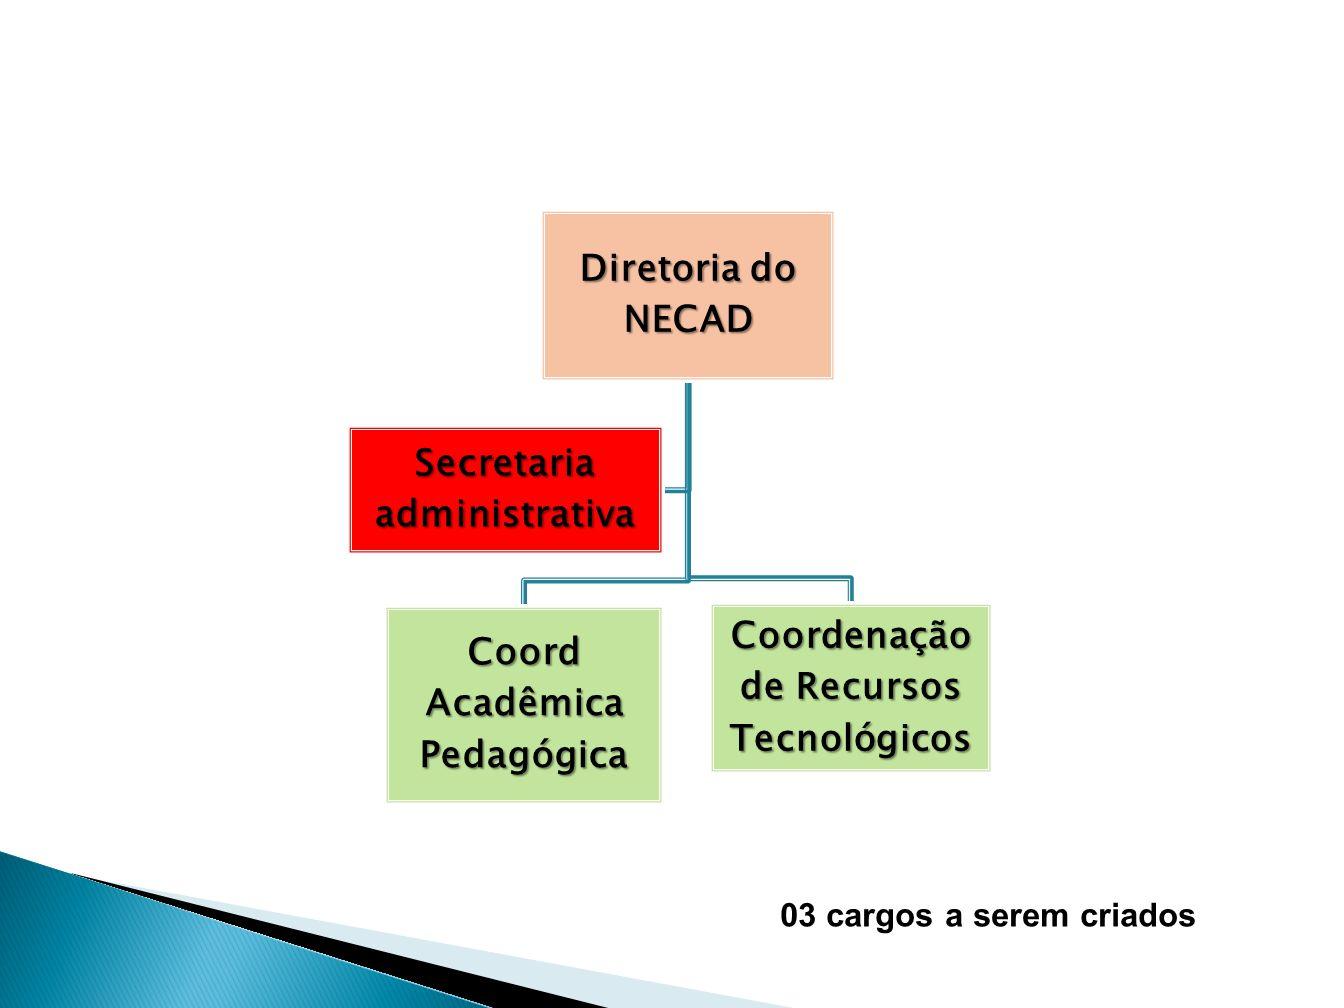 Secretaria administrativa Coord Acadêmica Pedagógica